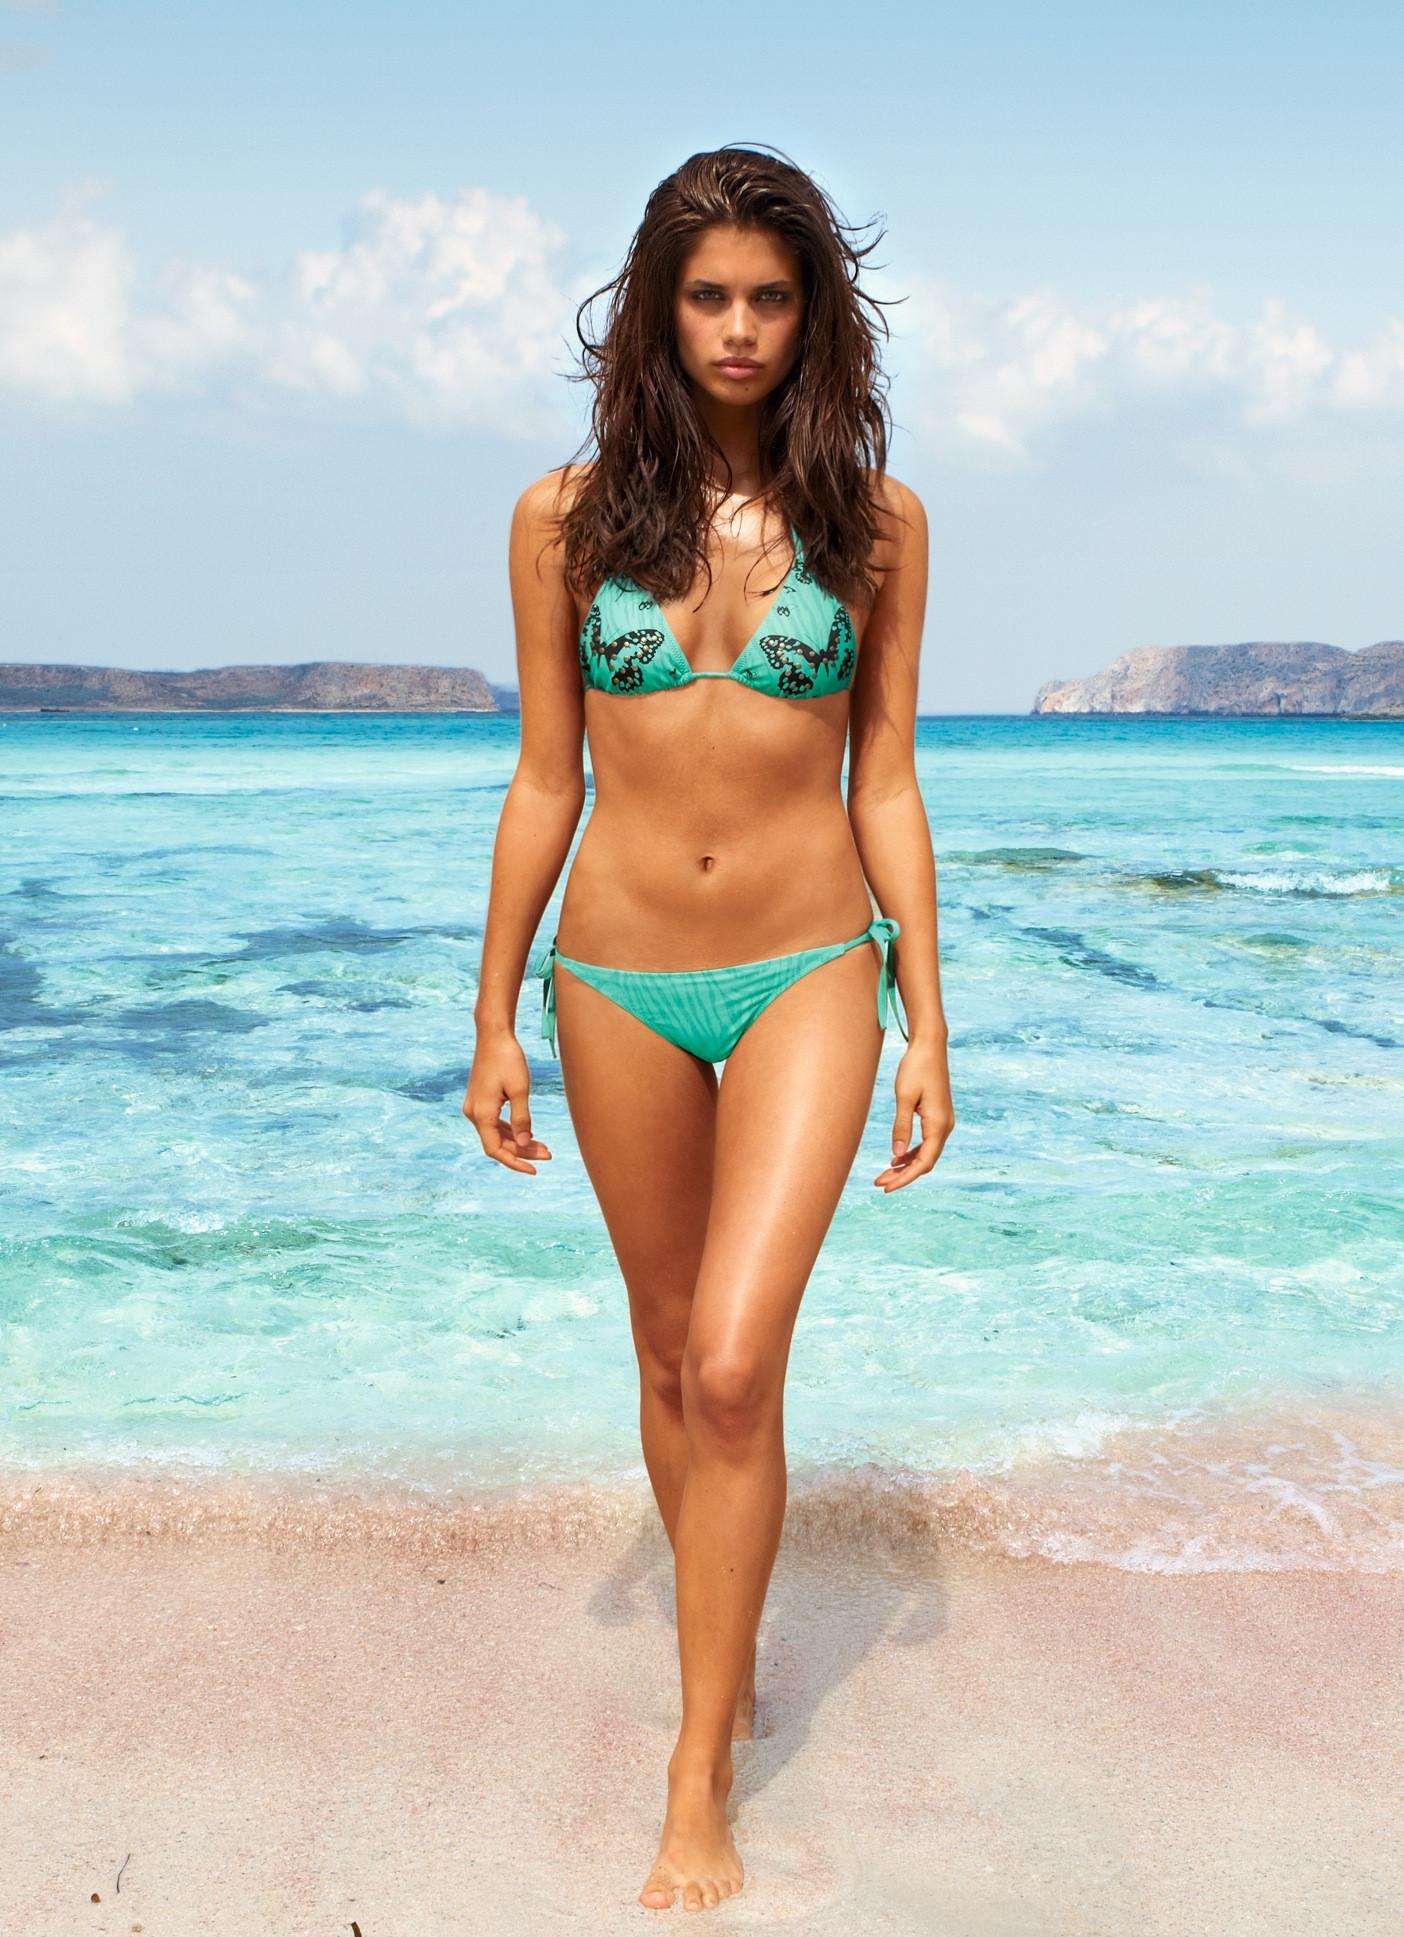 Babe Hd download sexy babe sara sampaio in bikini for calzedonia